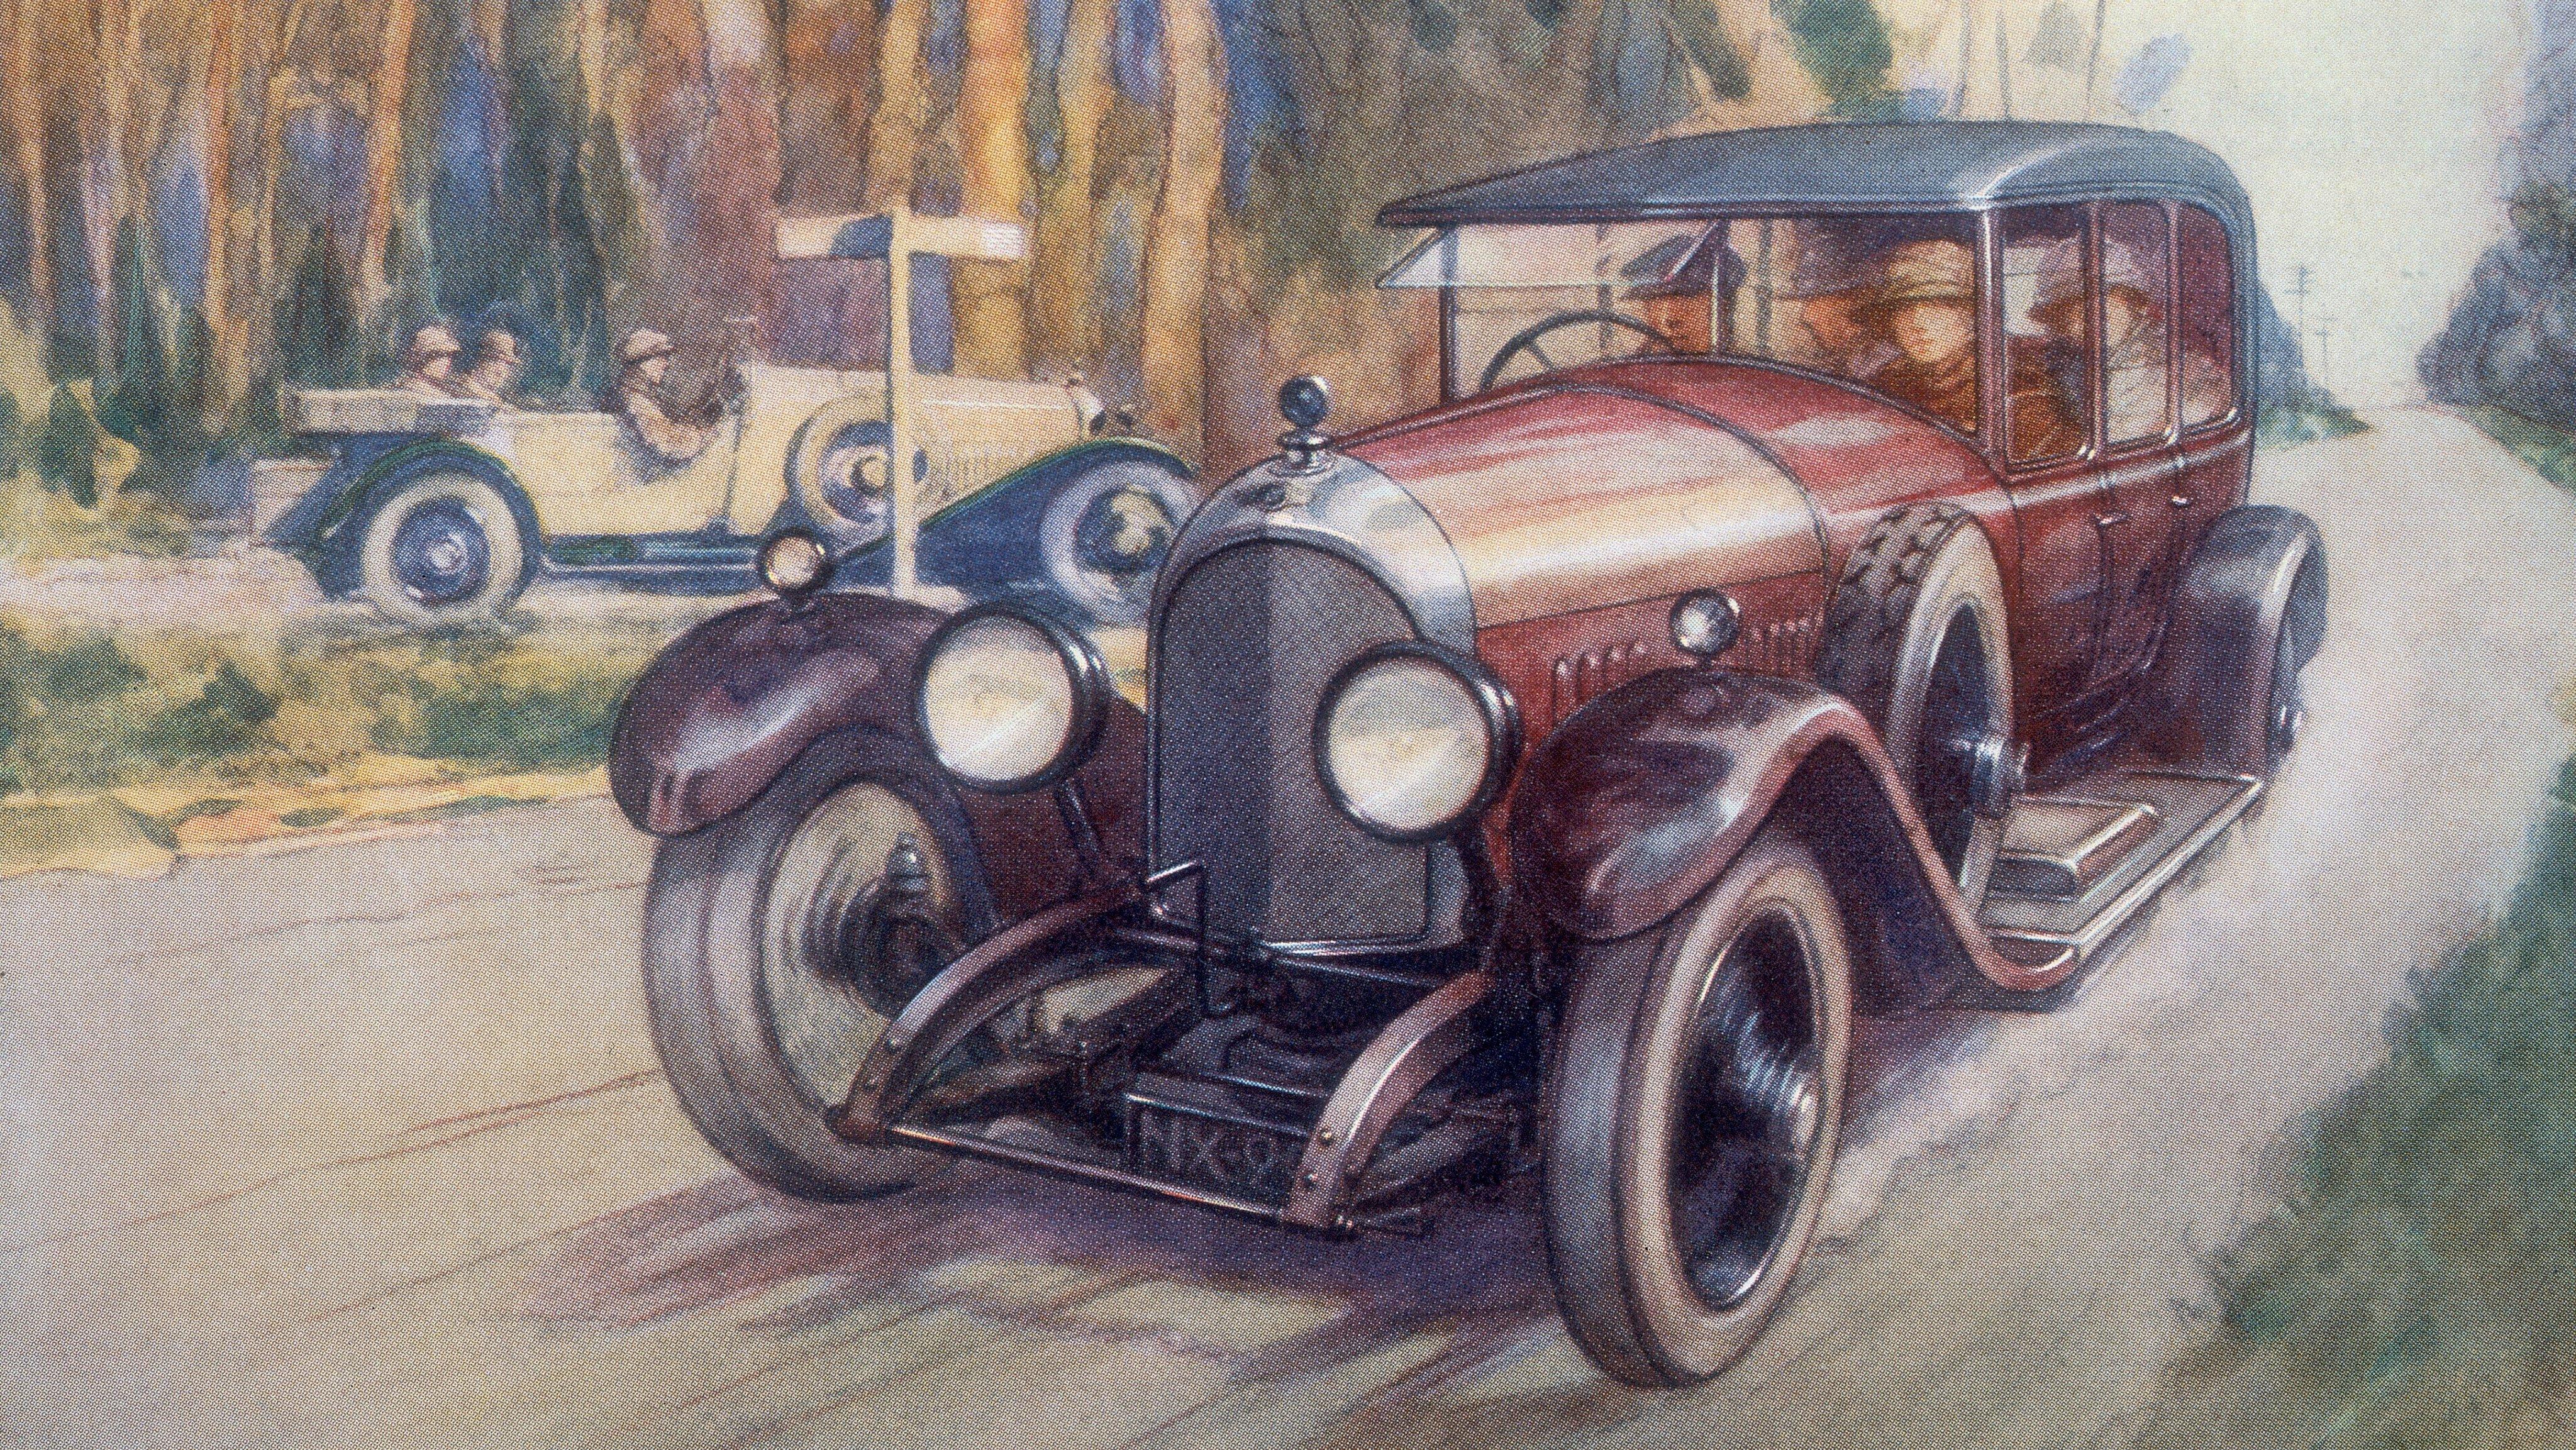 Poster advertising Bentley cars, 1927. Artist: Gordon Crosby